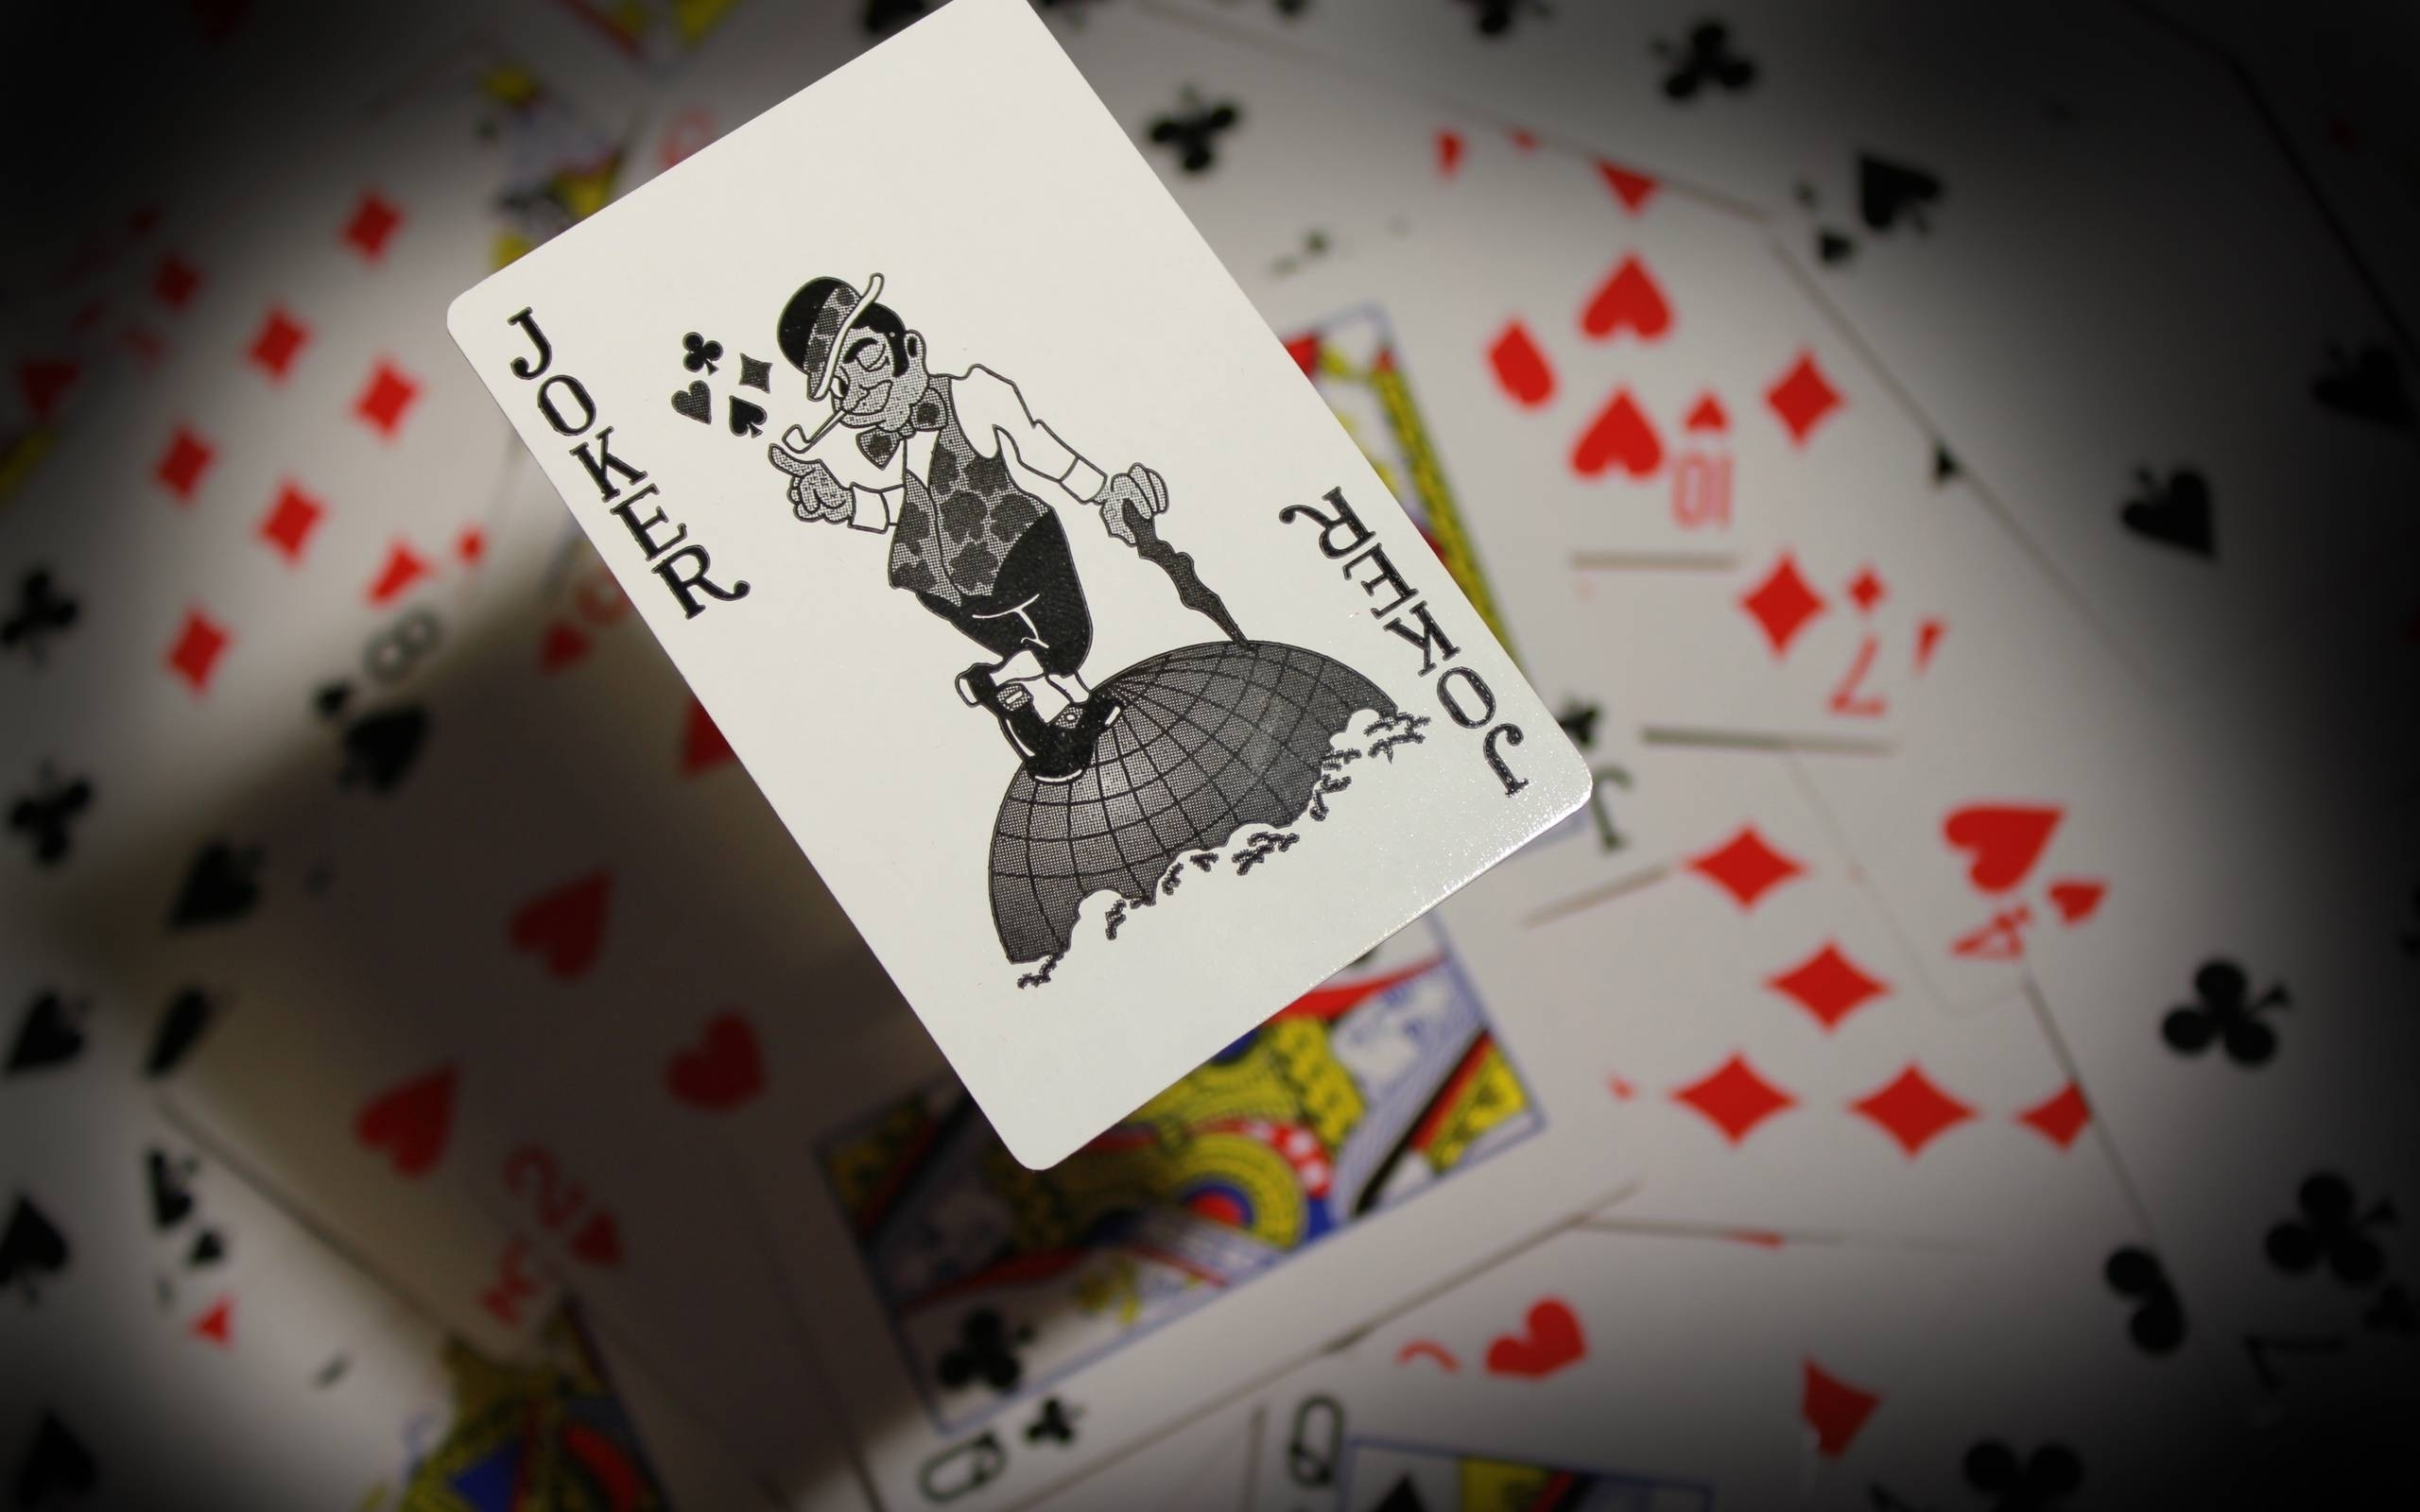 10 top deck of cards wallpaper full hd 1920×1080 for pc desktop